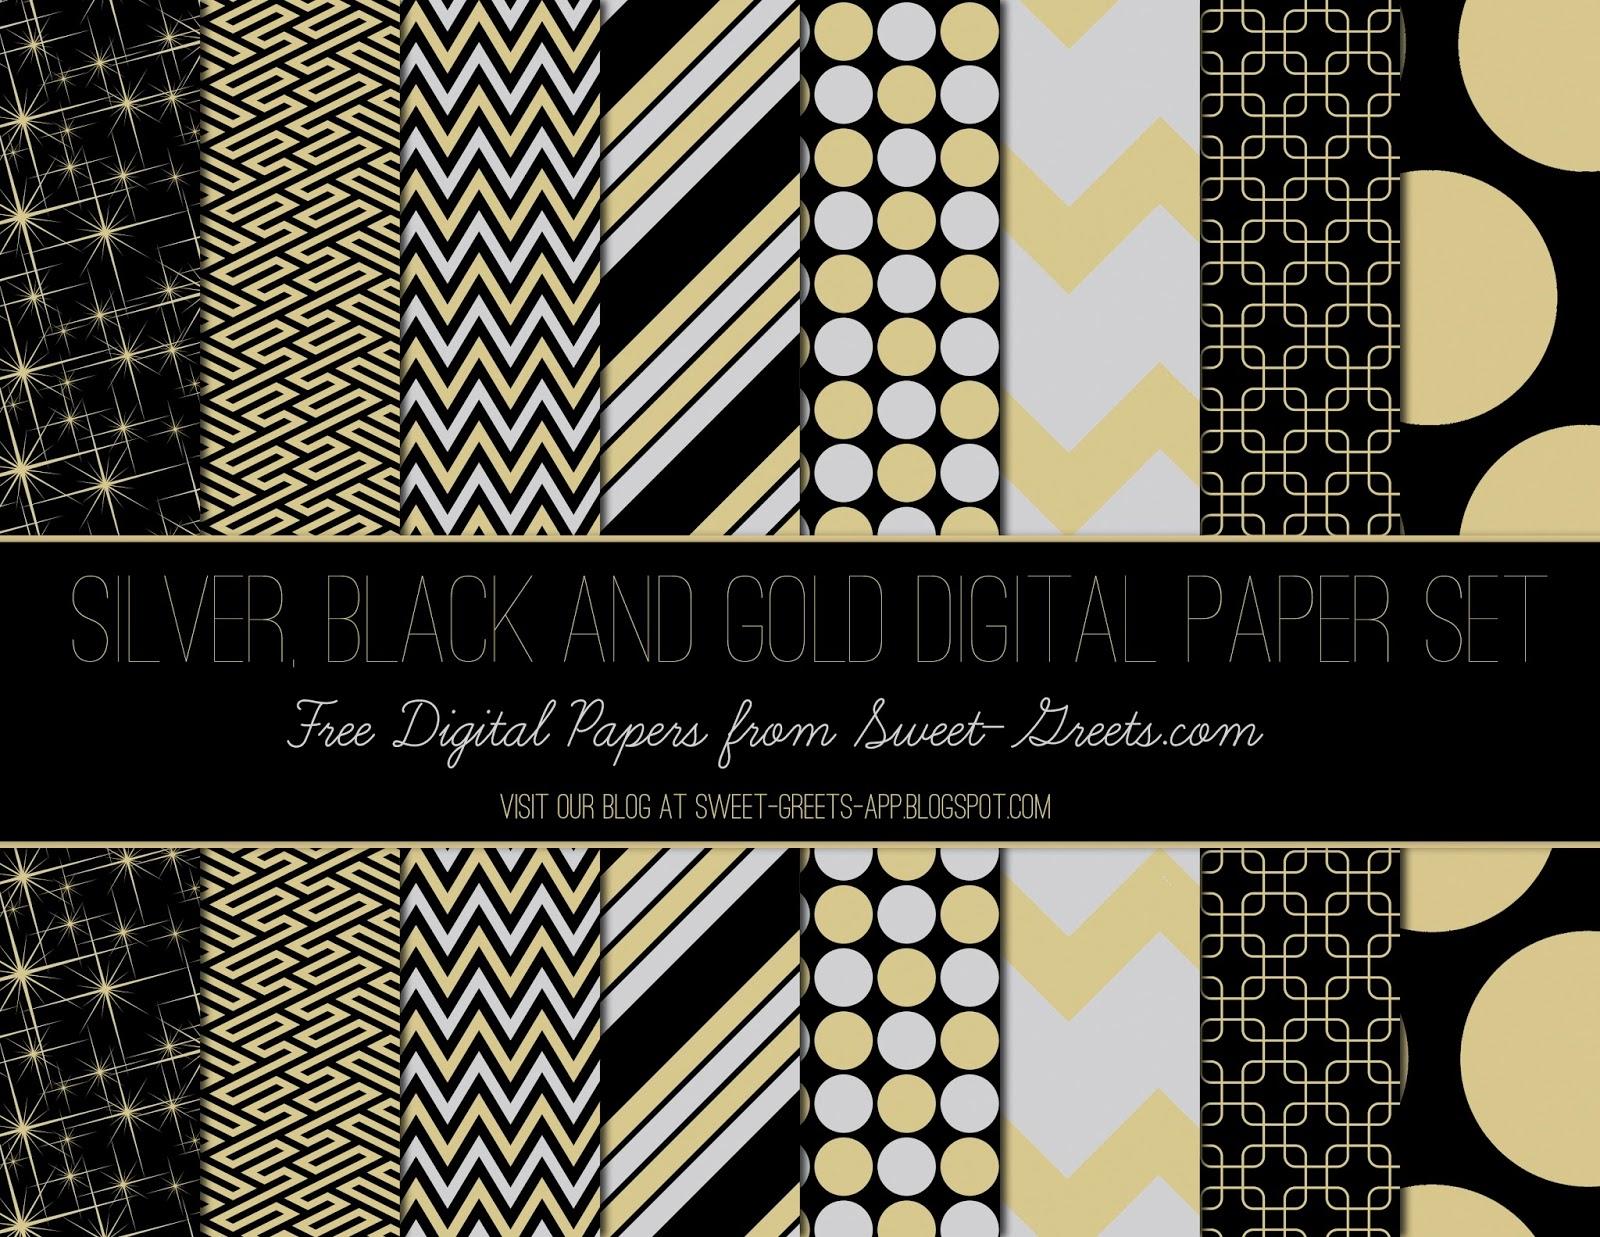 Free Digital Paper